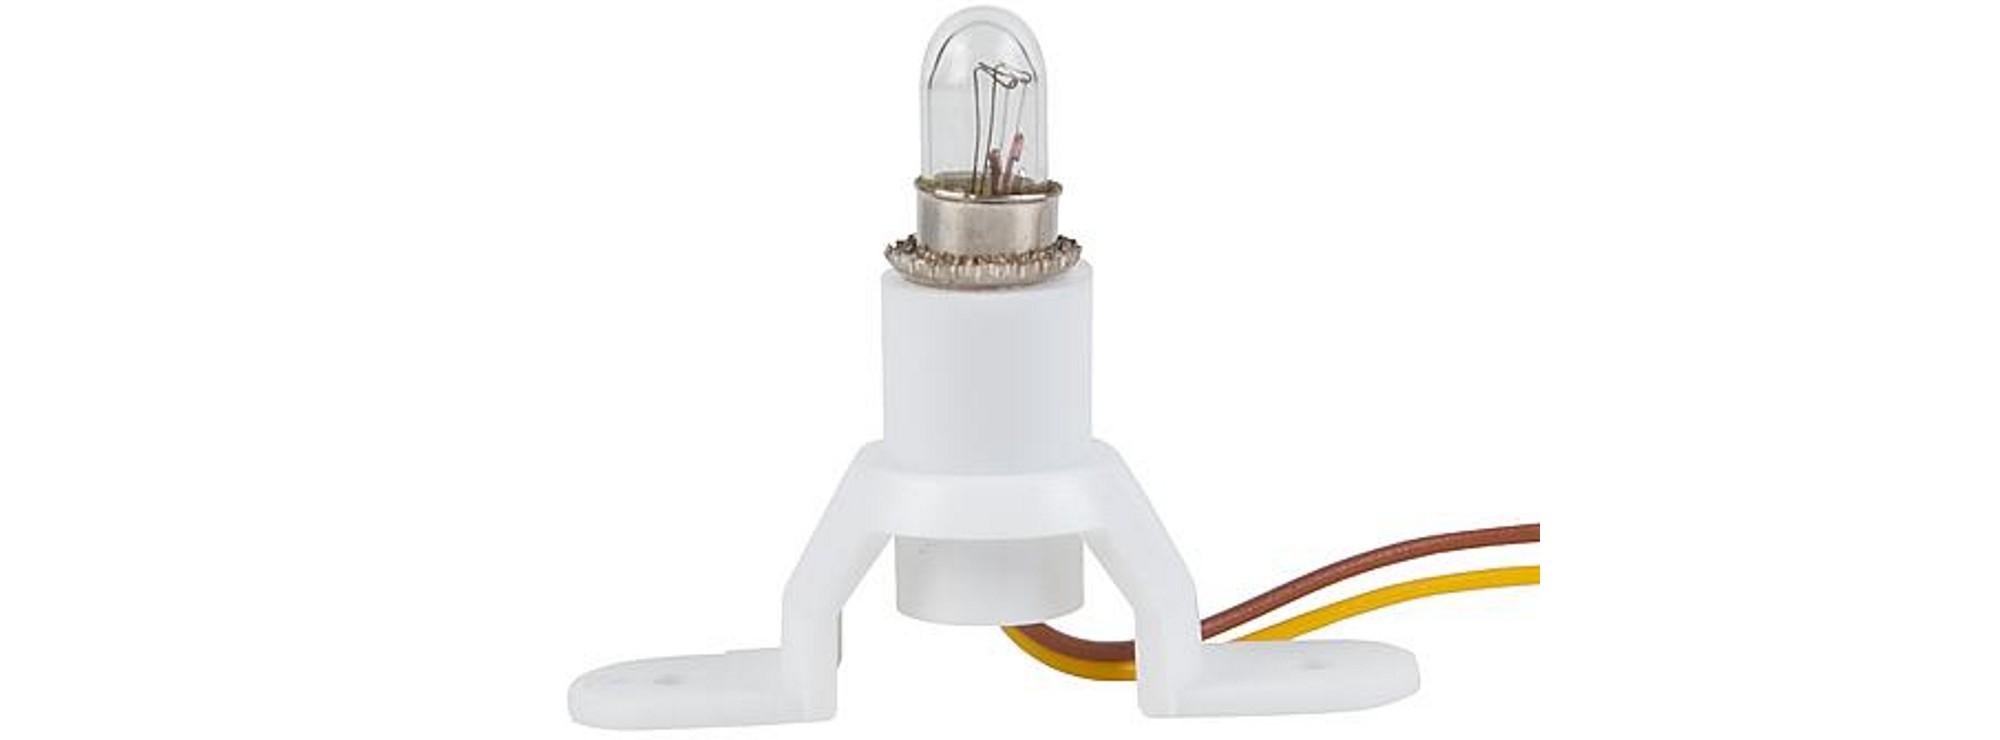 Faller 180670 Beleuchtungssockel 12 16 Volt Mit Birne E 5 5 Mm 1 Stuck Online Kaufen Bei Modellbau Hartle